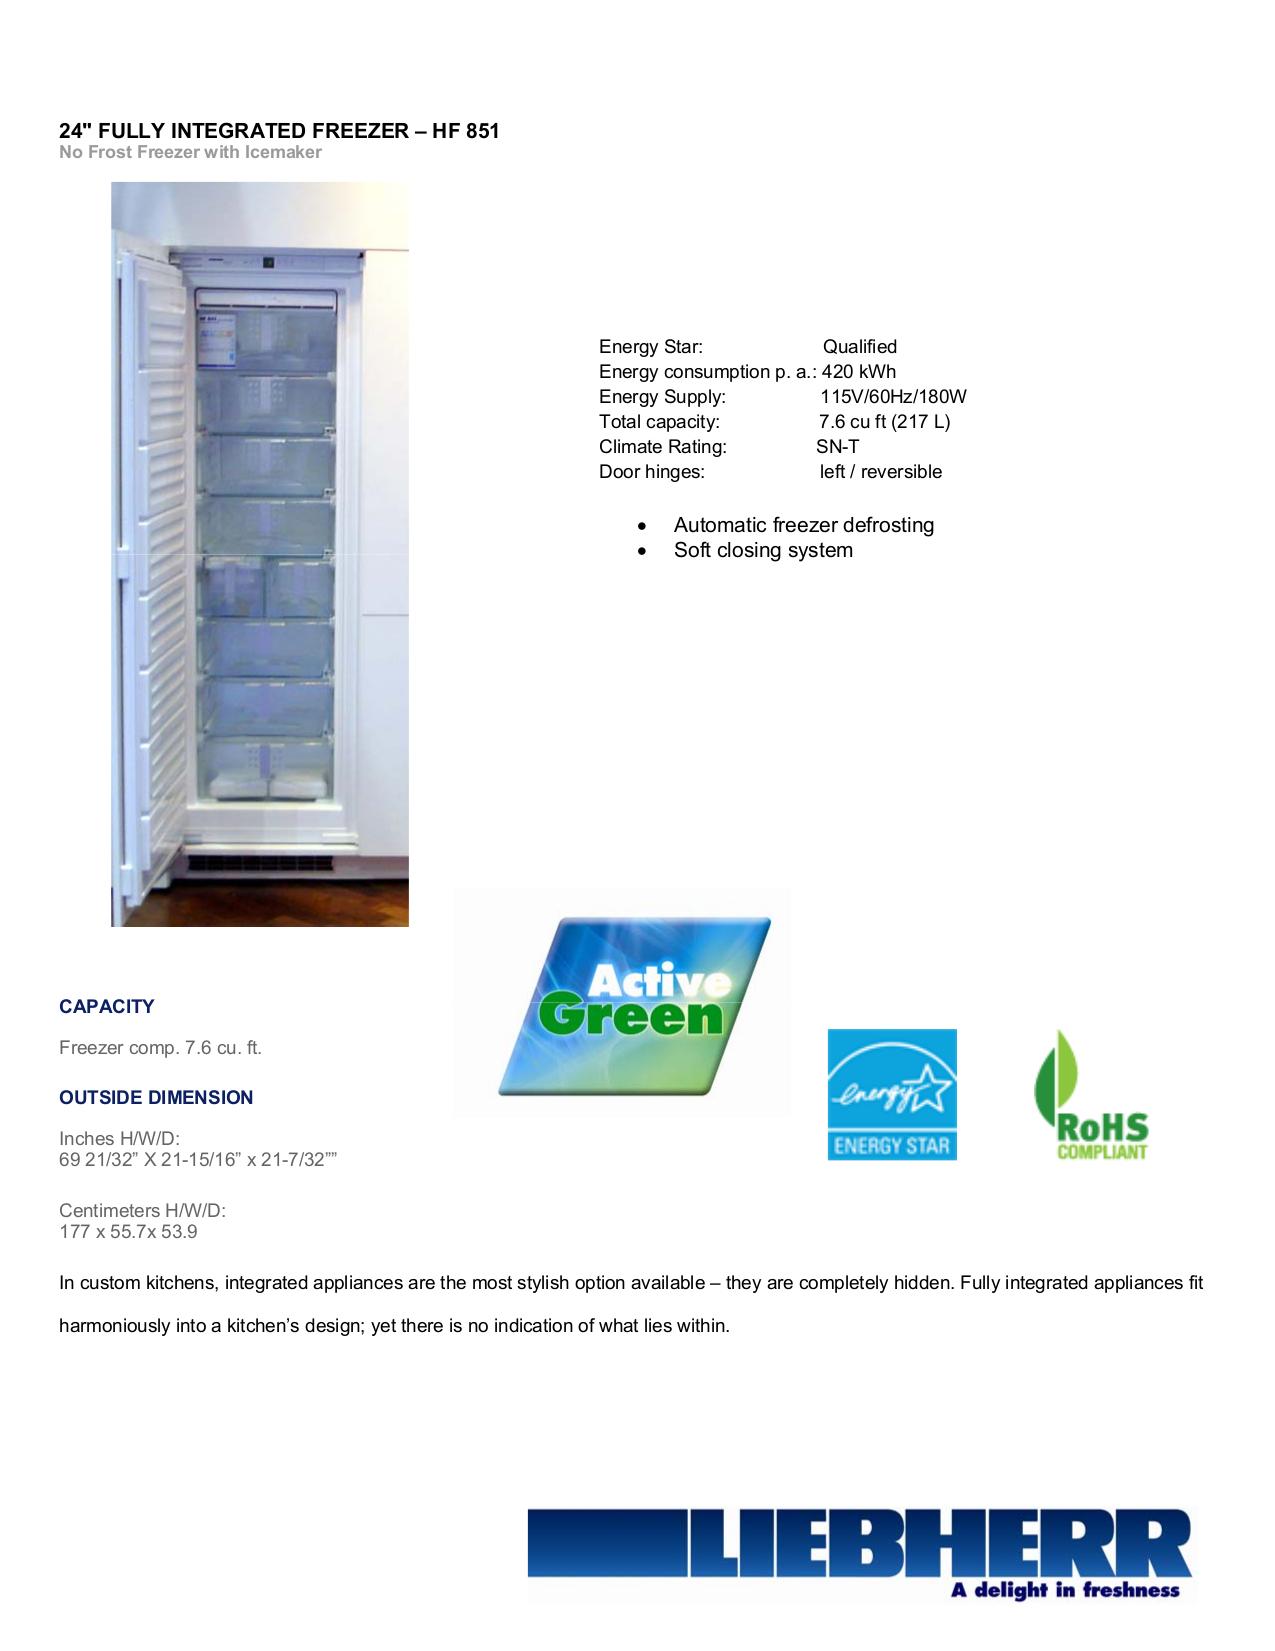 pdf for Liebherr Freezer HF851 manual